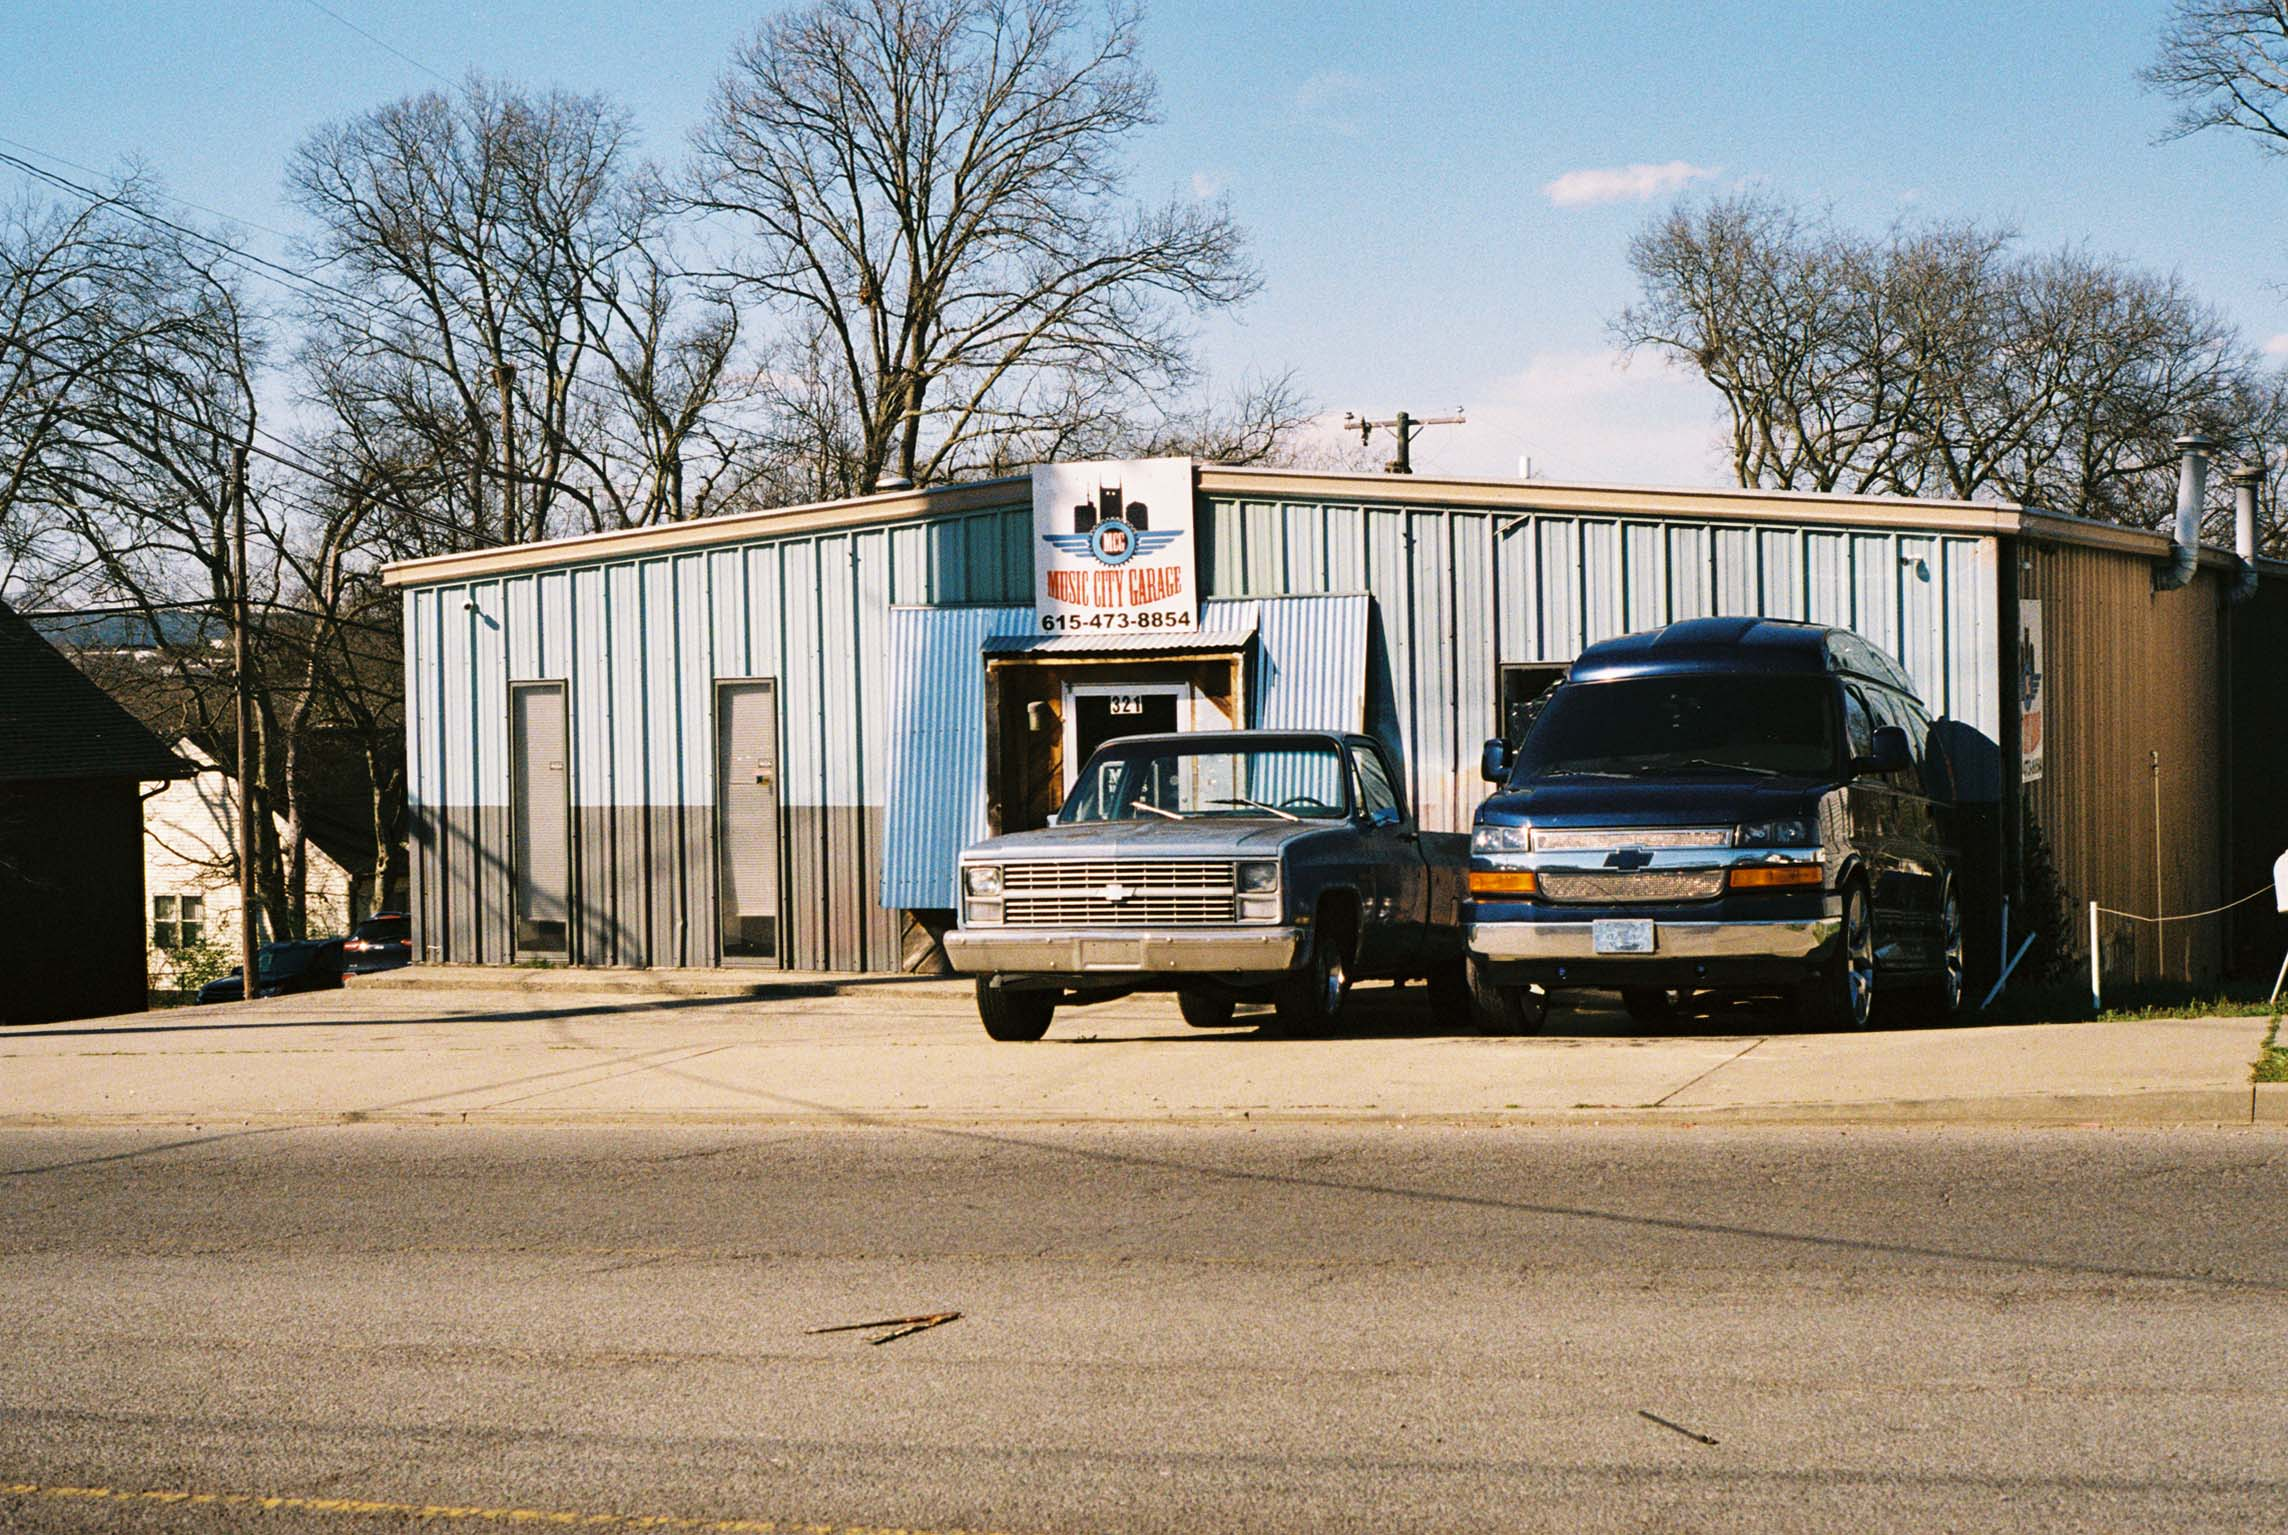 East Nashville.  Tennessee.  Kodak Ultra Max 400. Pentax K1000. Fletcher Berryman 2019.